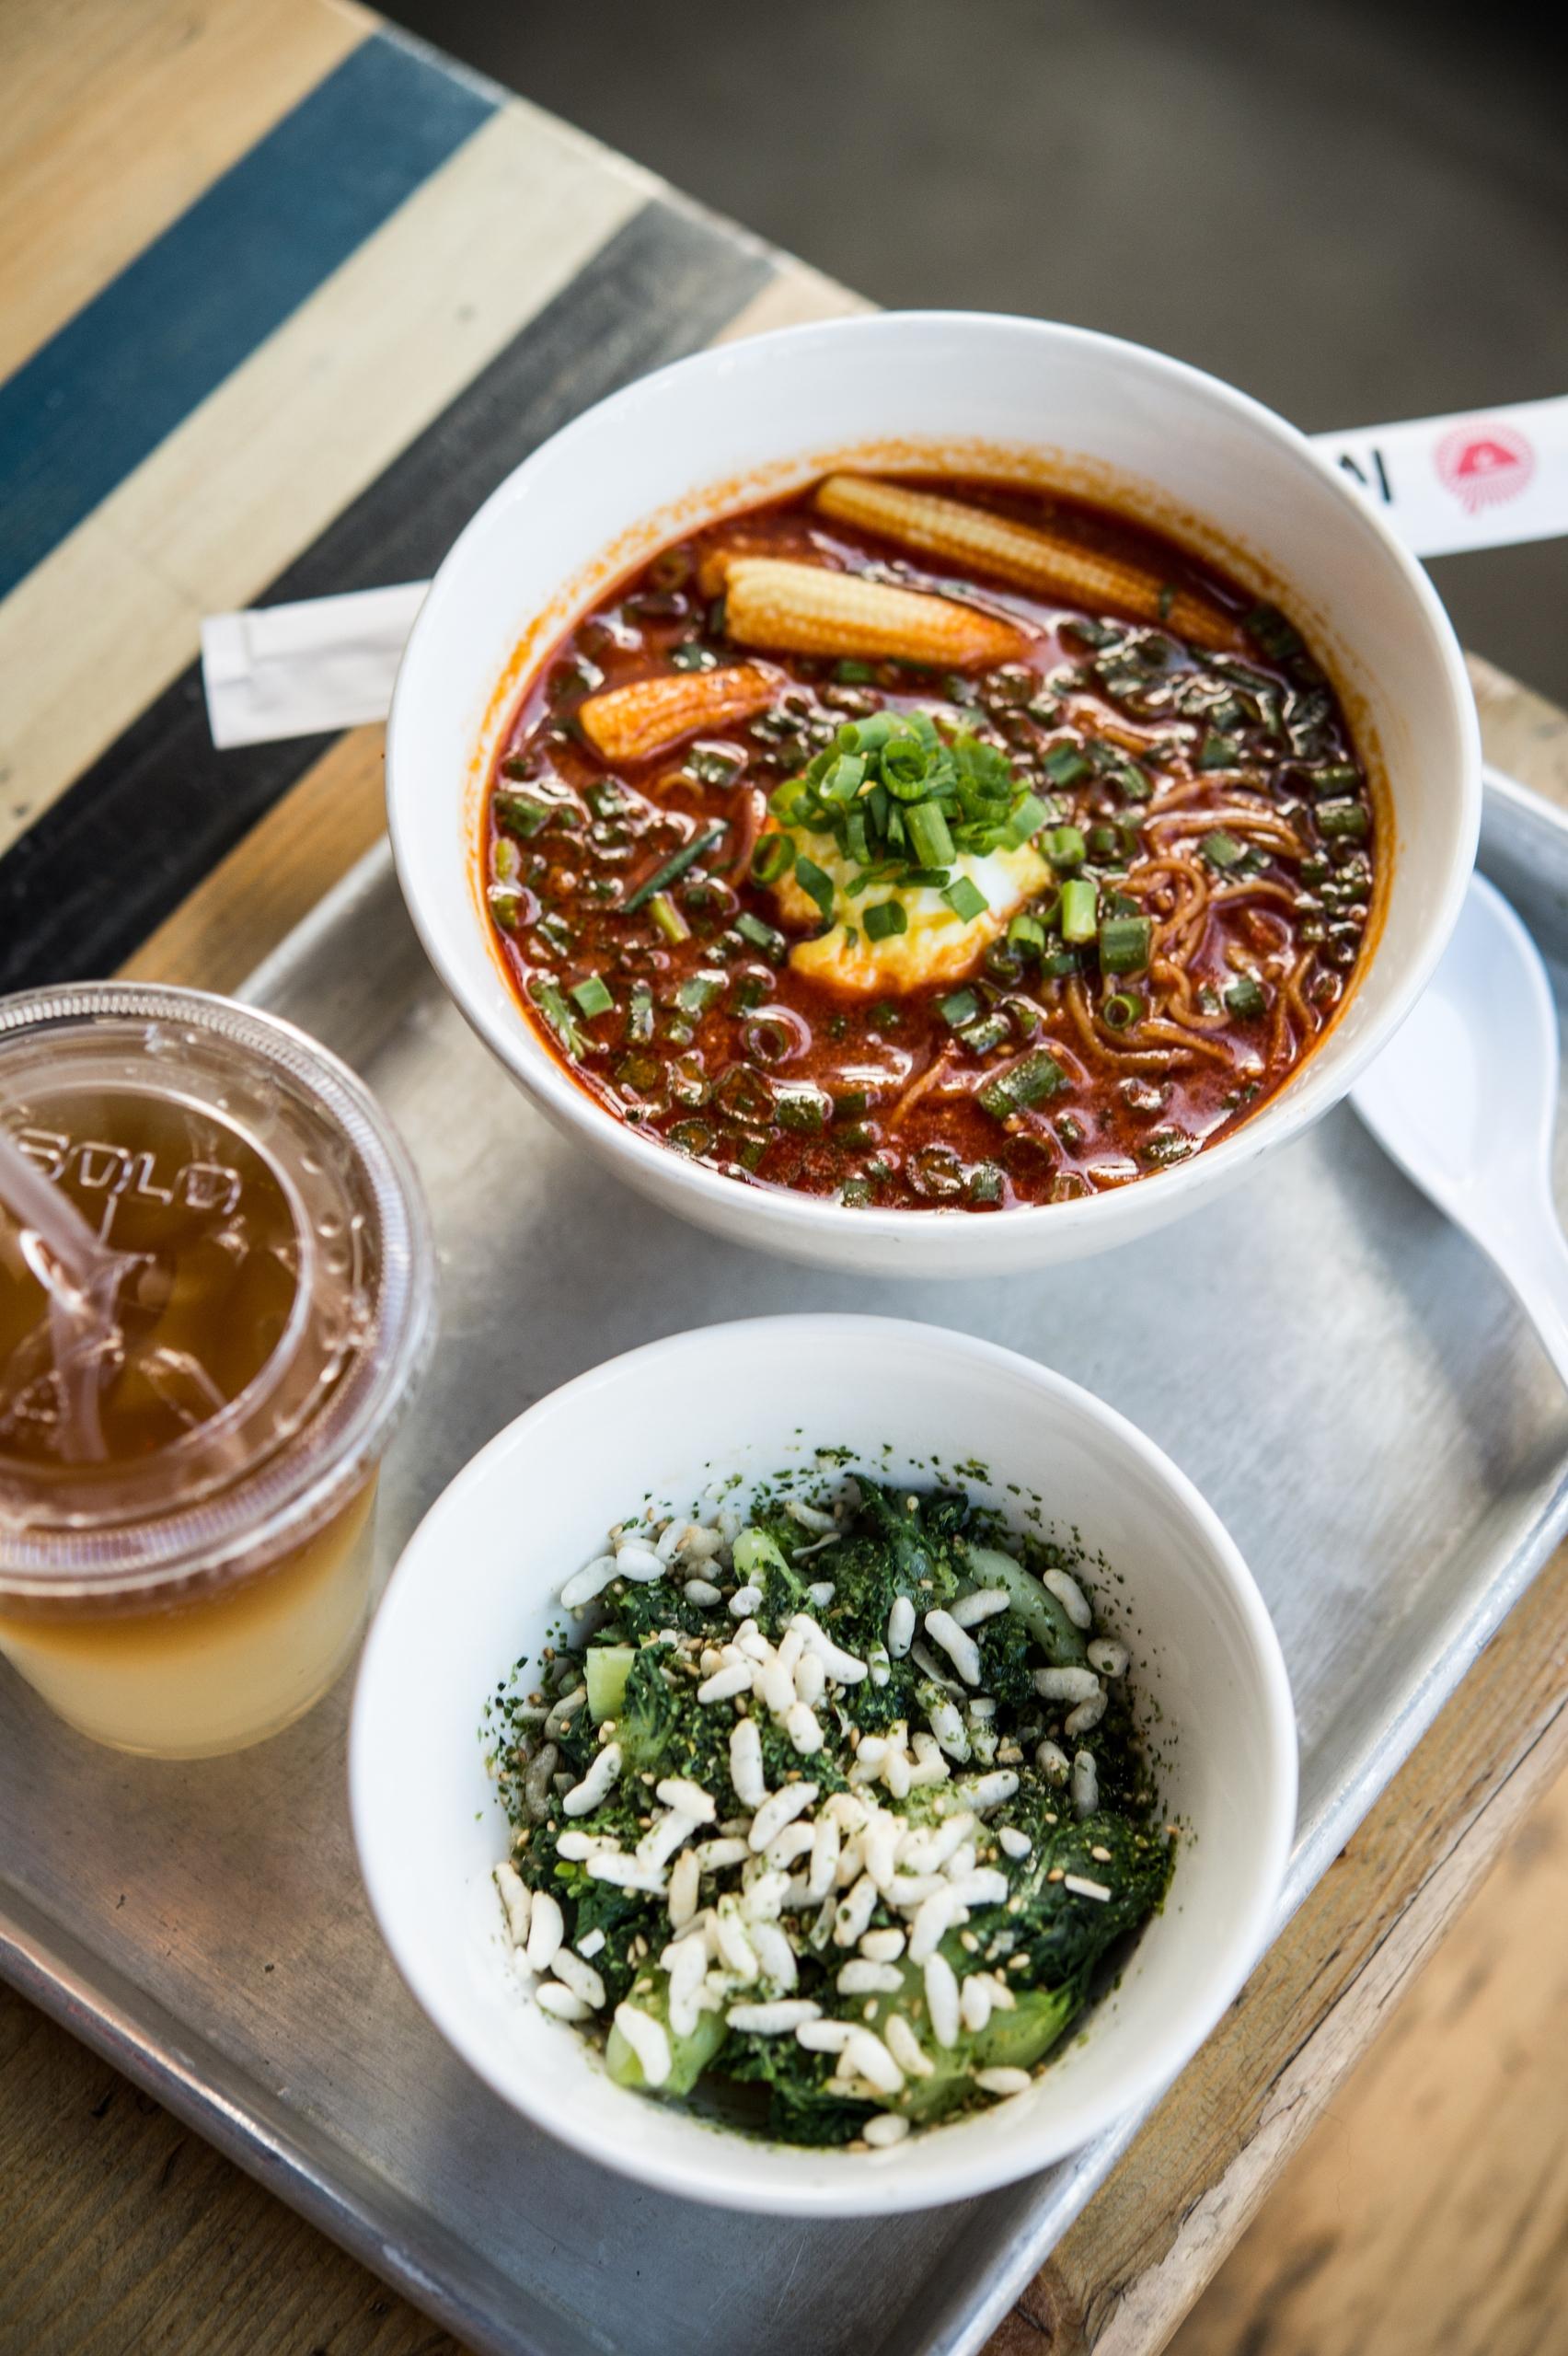 Spicy ramen lunch special Slurp - danielkrieger | ello